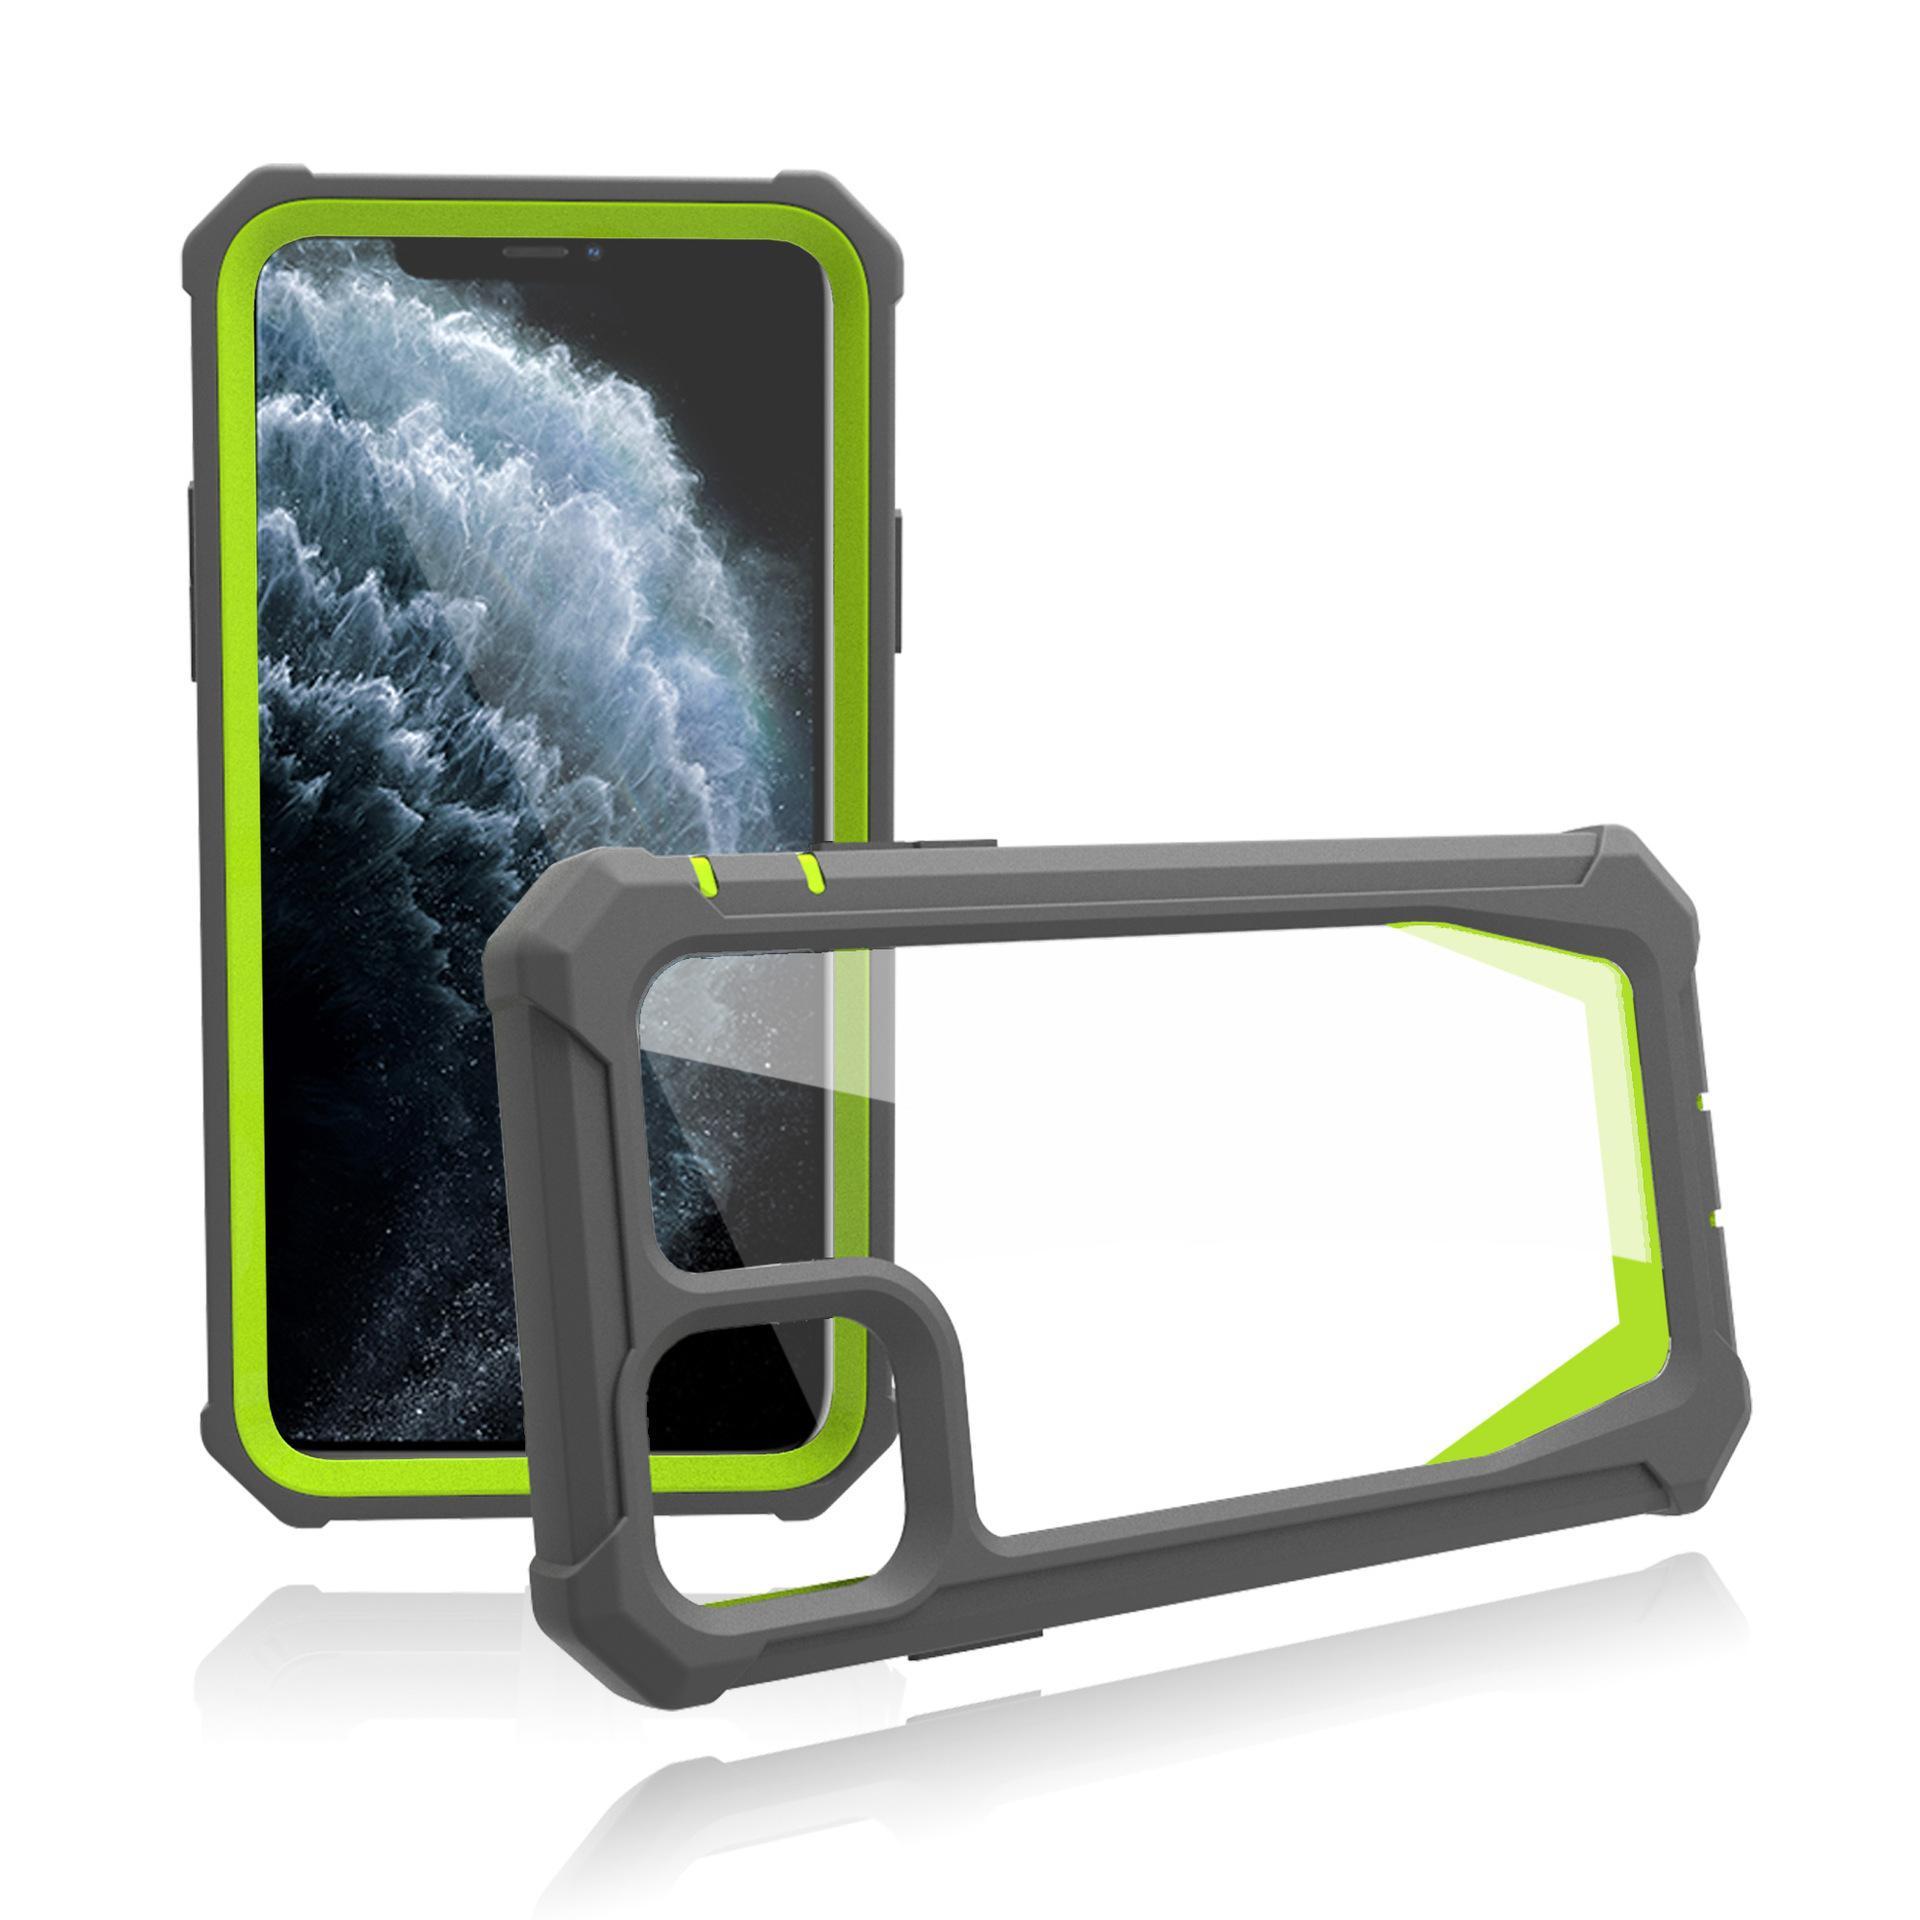 Stoßfänger Stoßfest Transparente Telefongehäuse für iPhone 11 12 PRO MAX XR 8 7 Plus Schutzhülle Mantel Antimall kratzfest vier Eckschutz